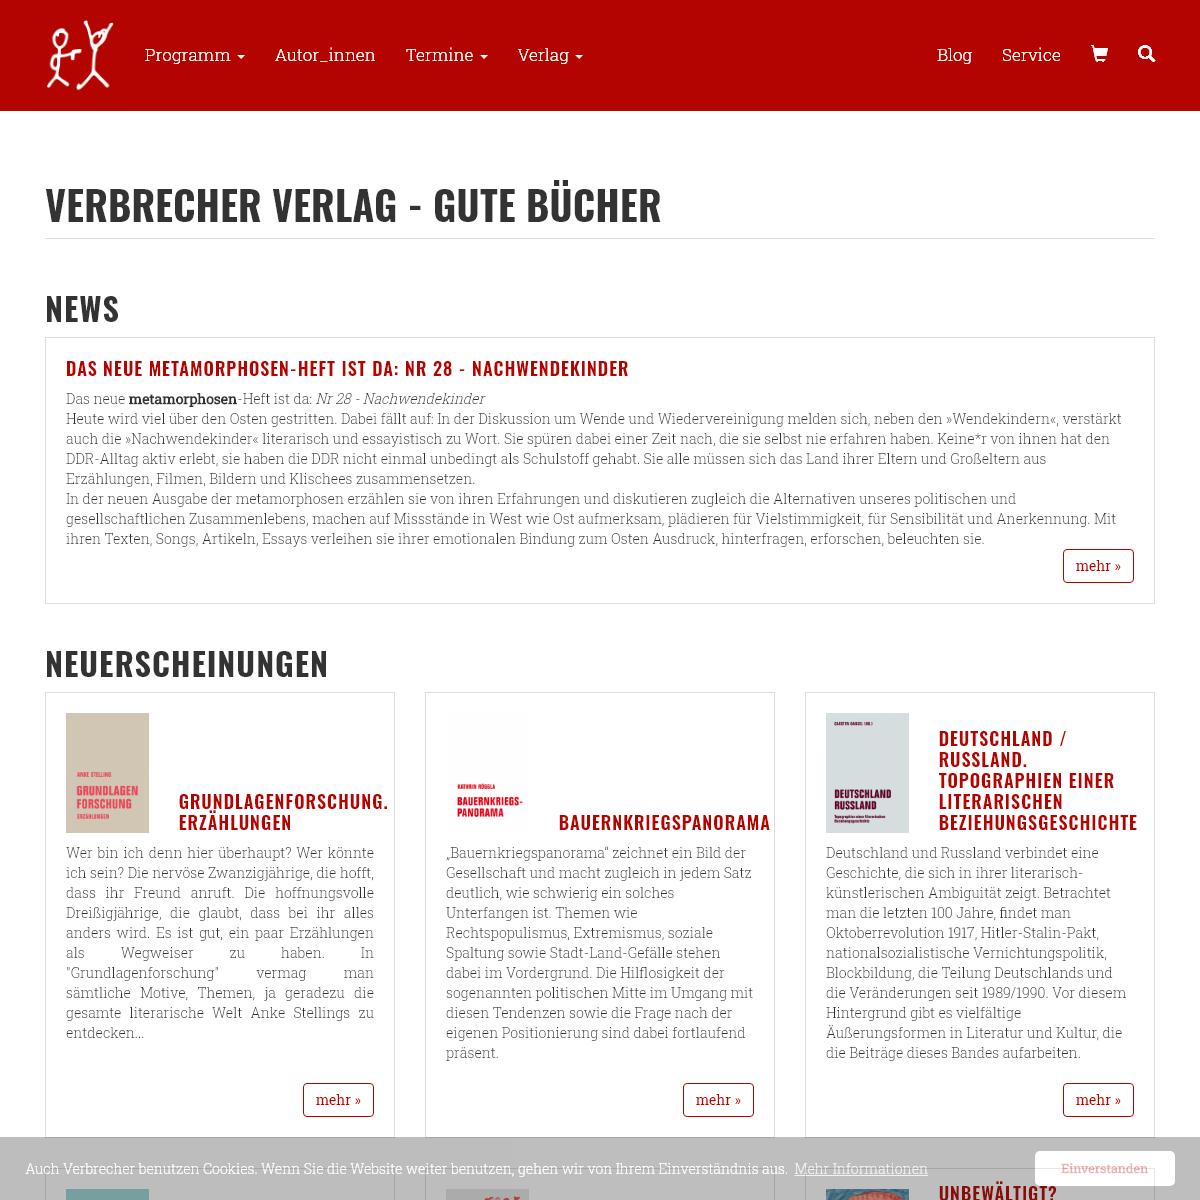 Verbrecher Verlag - gute Bücher